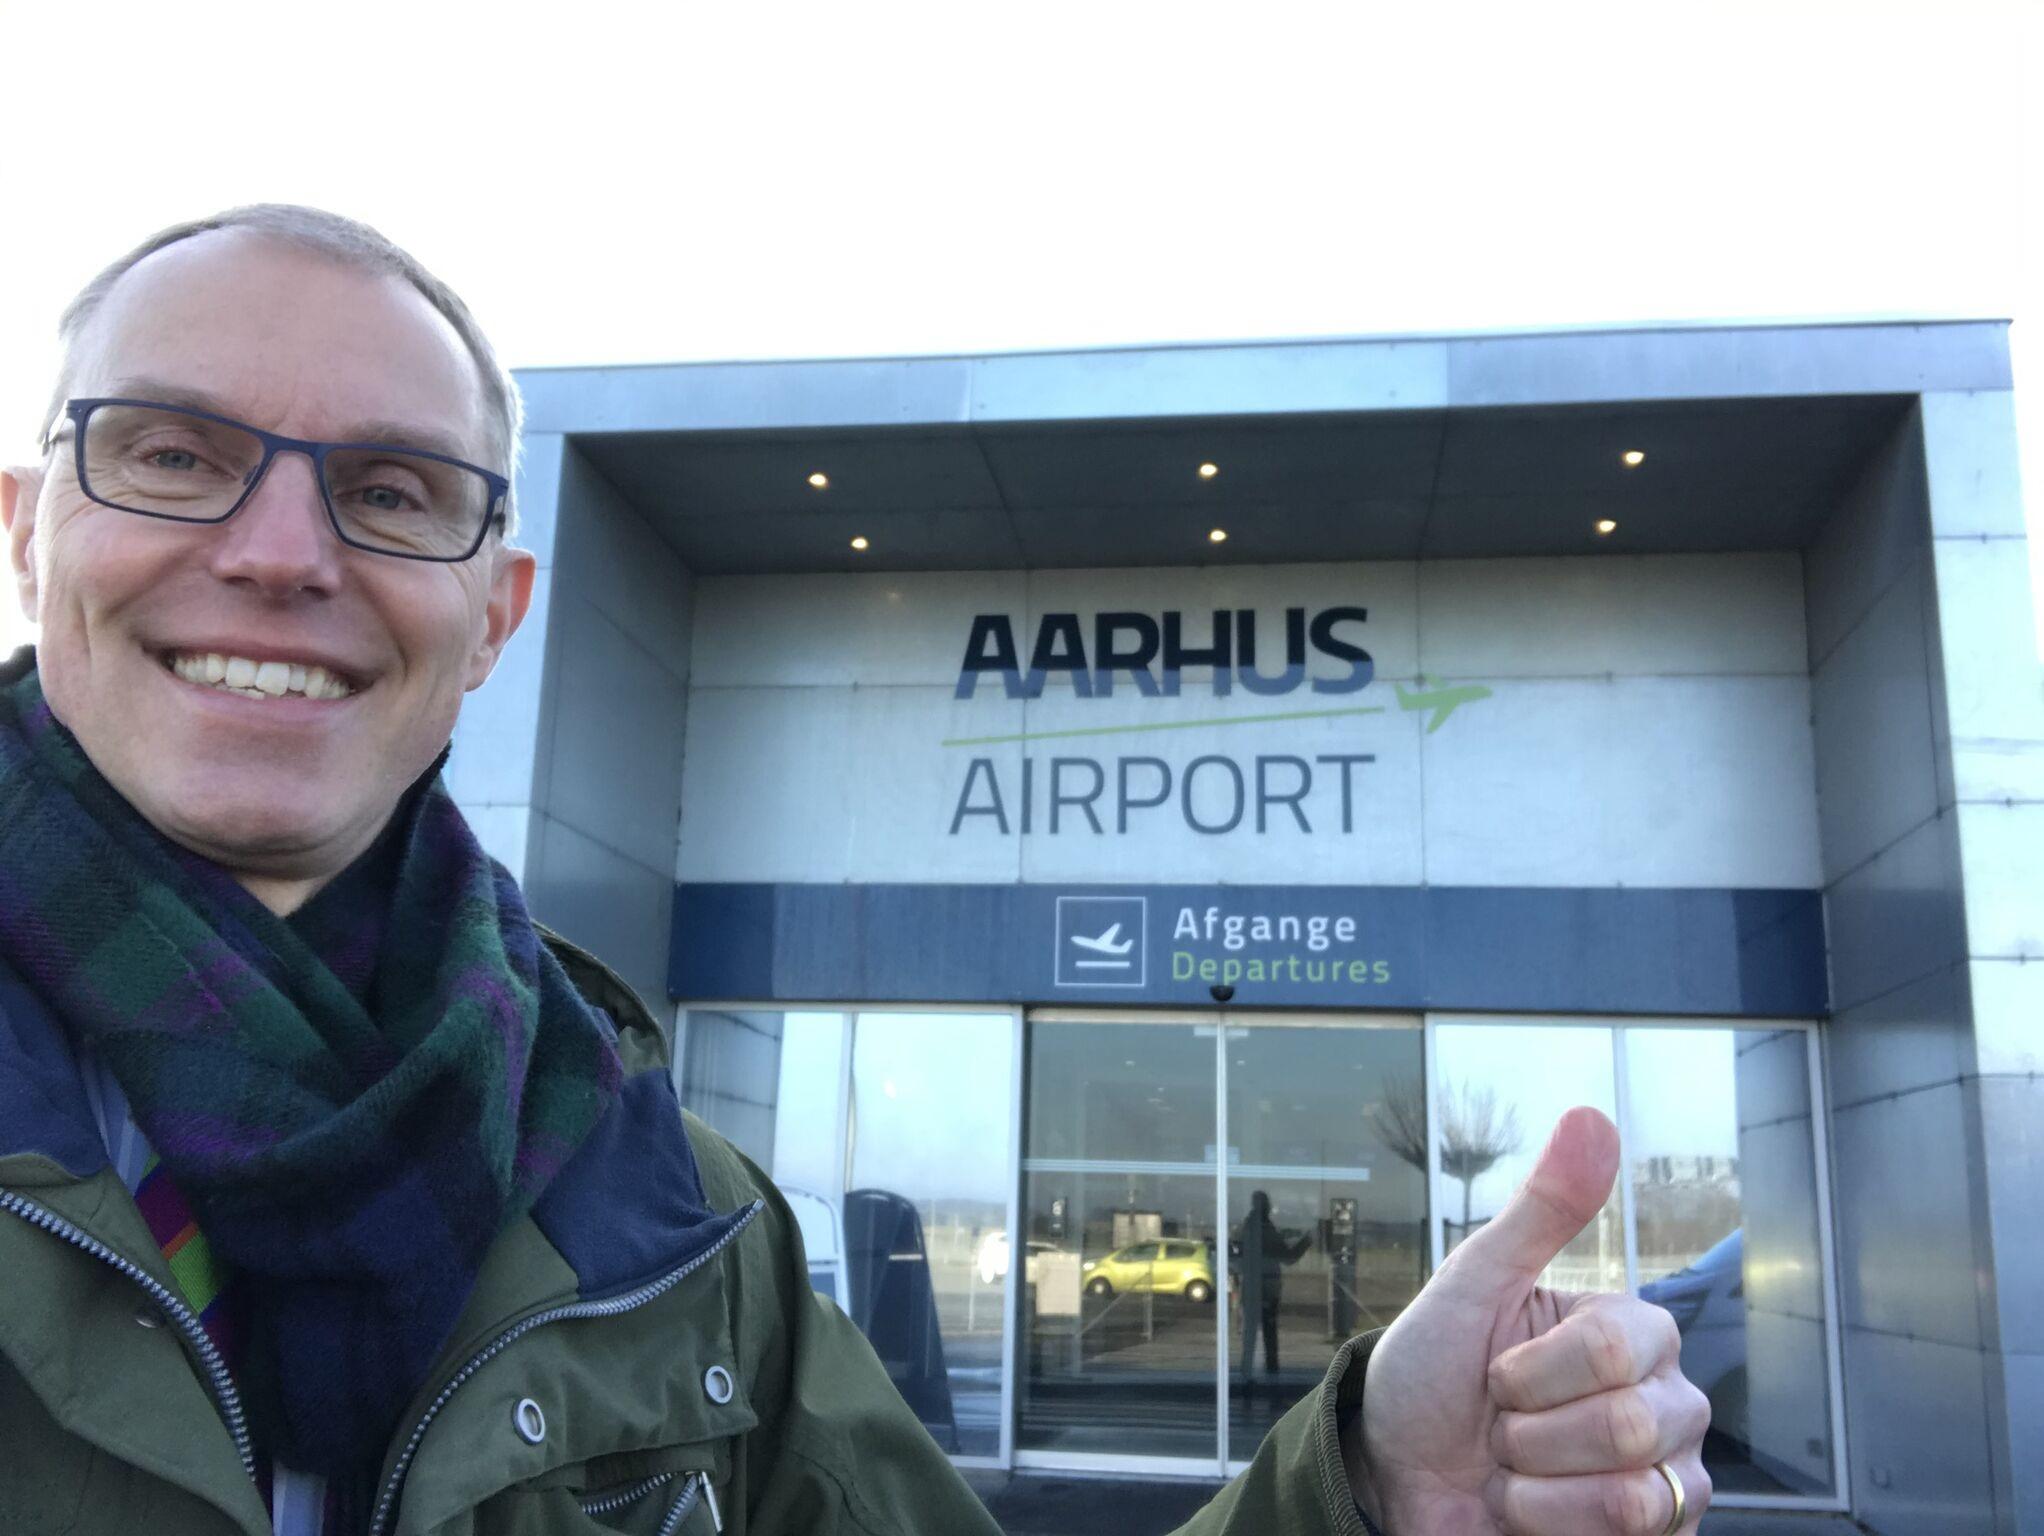 Peter Møller Laursen, kommerciel direktør i Aarhus Lufthavn. (Privatfoto)